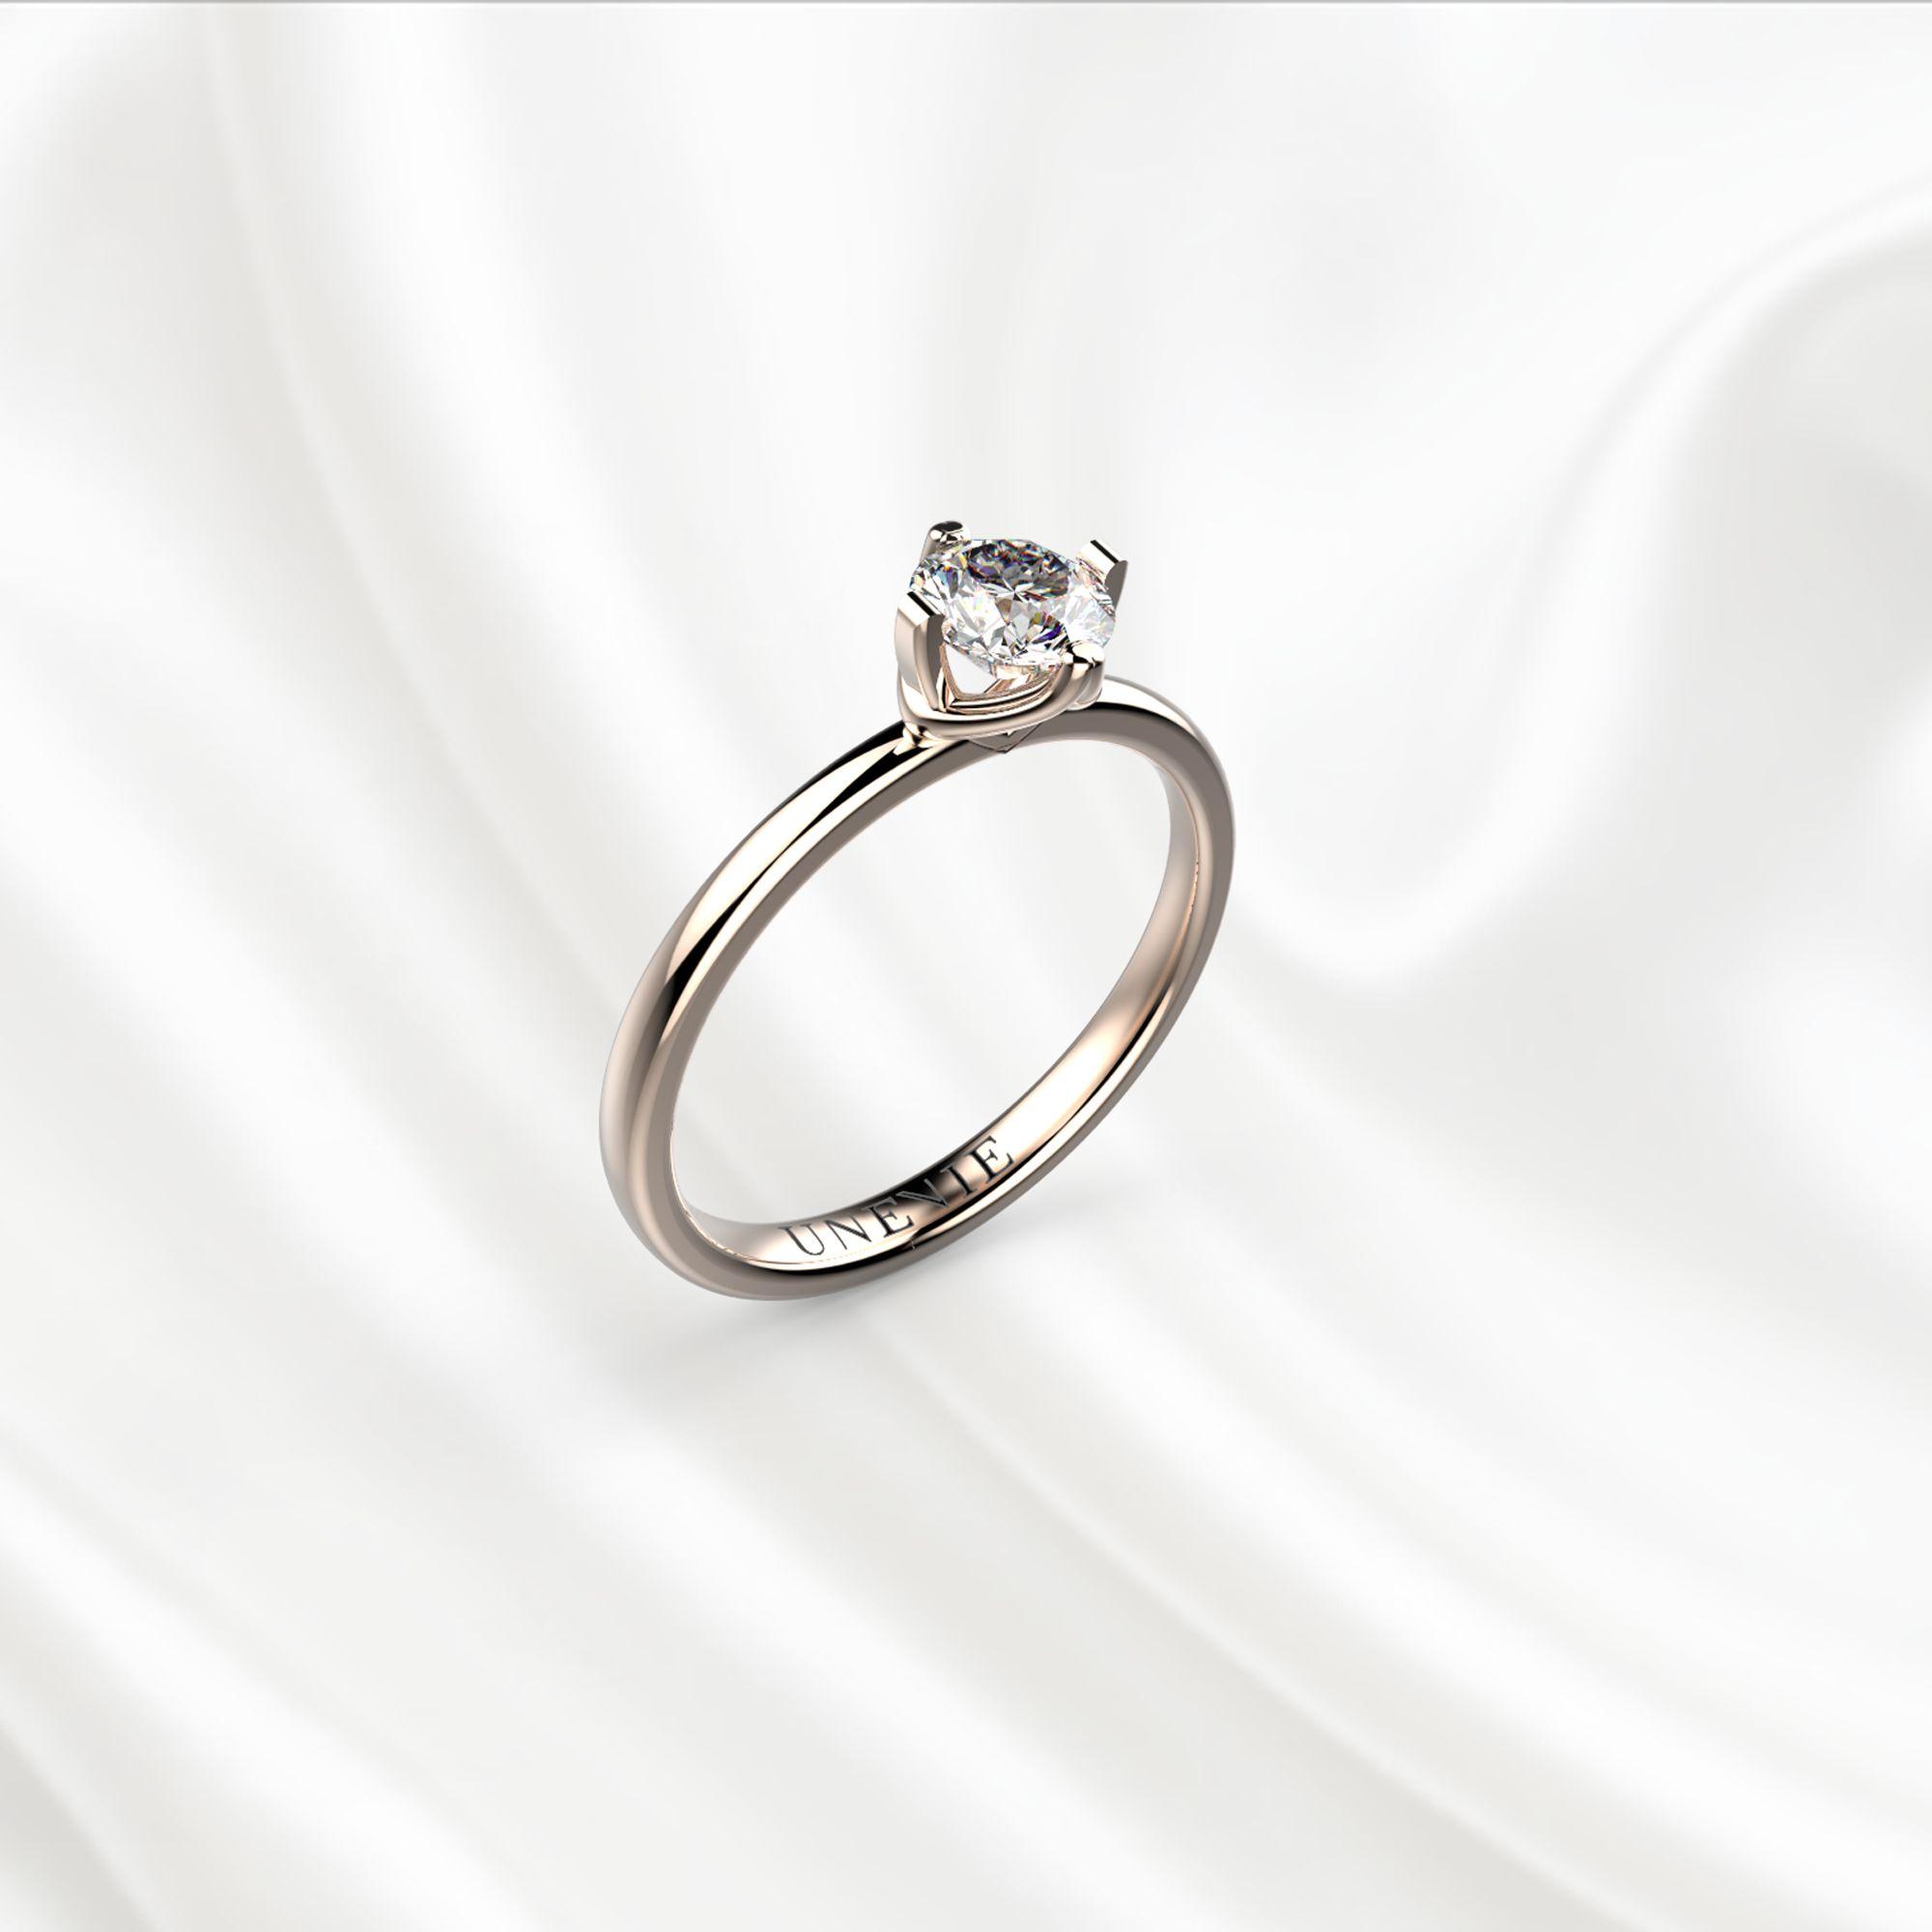 N12 Помолвочное кольцо из розового золота с бриллиантом 0.3 карат